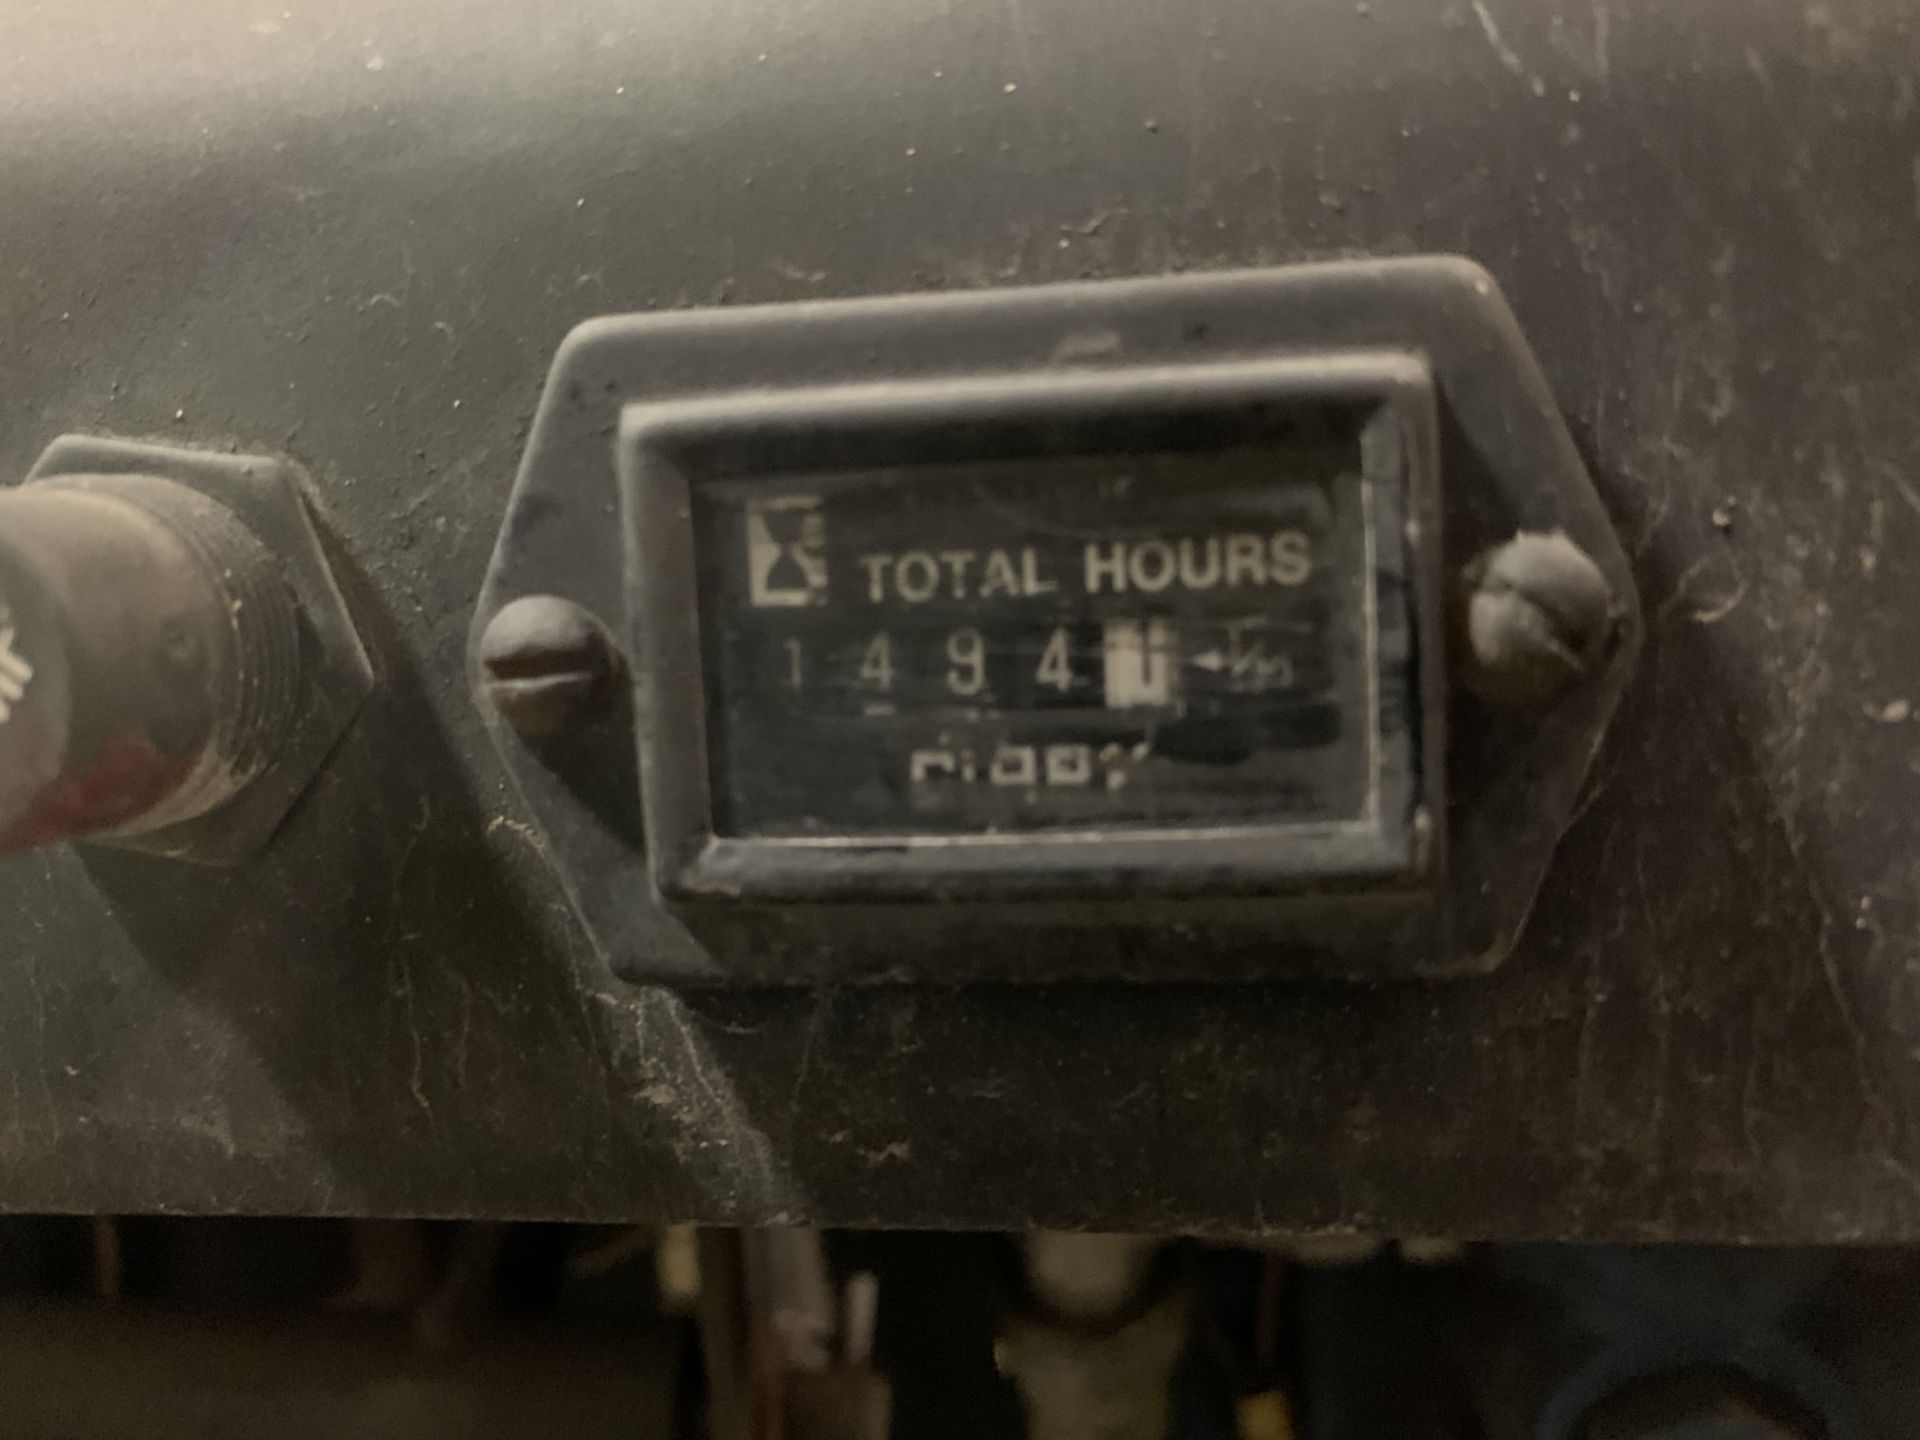 Lot 4 - CLARK 10,000-LB. CAPACITY FORKLIFT, MODEL: C500-S100, S/N: 685-0101–6655KOF, 3-STAGE MAST, 1,494 HRS